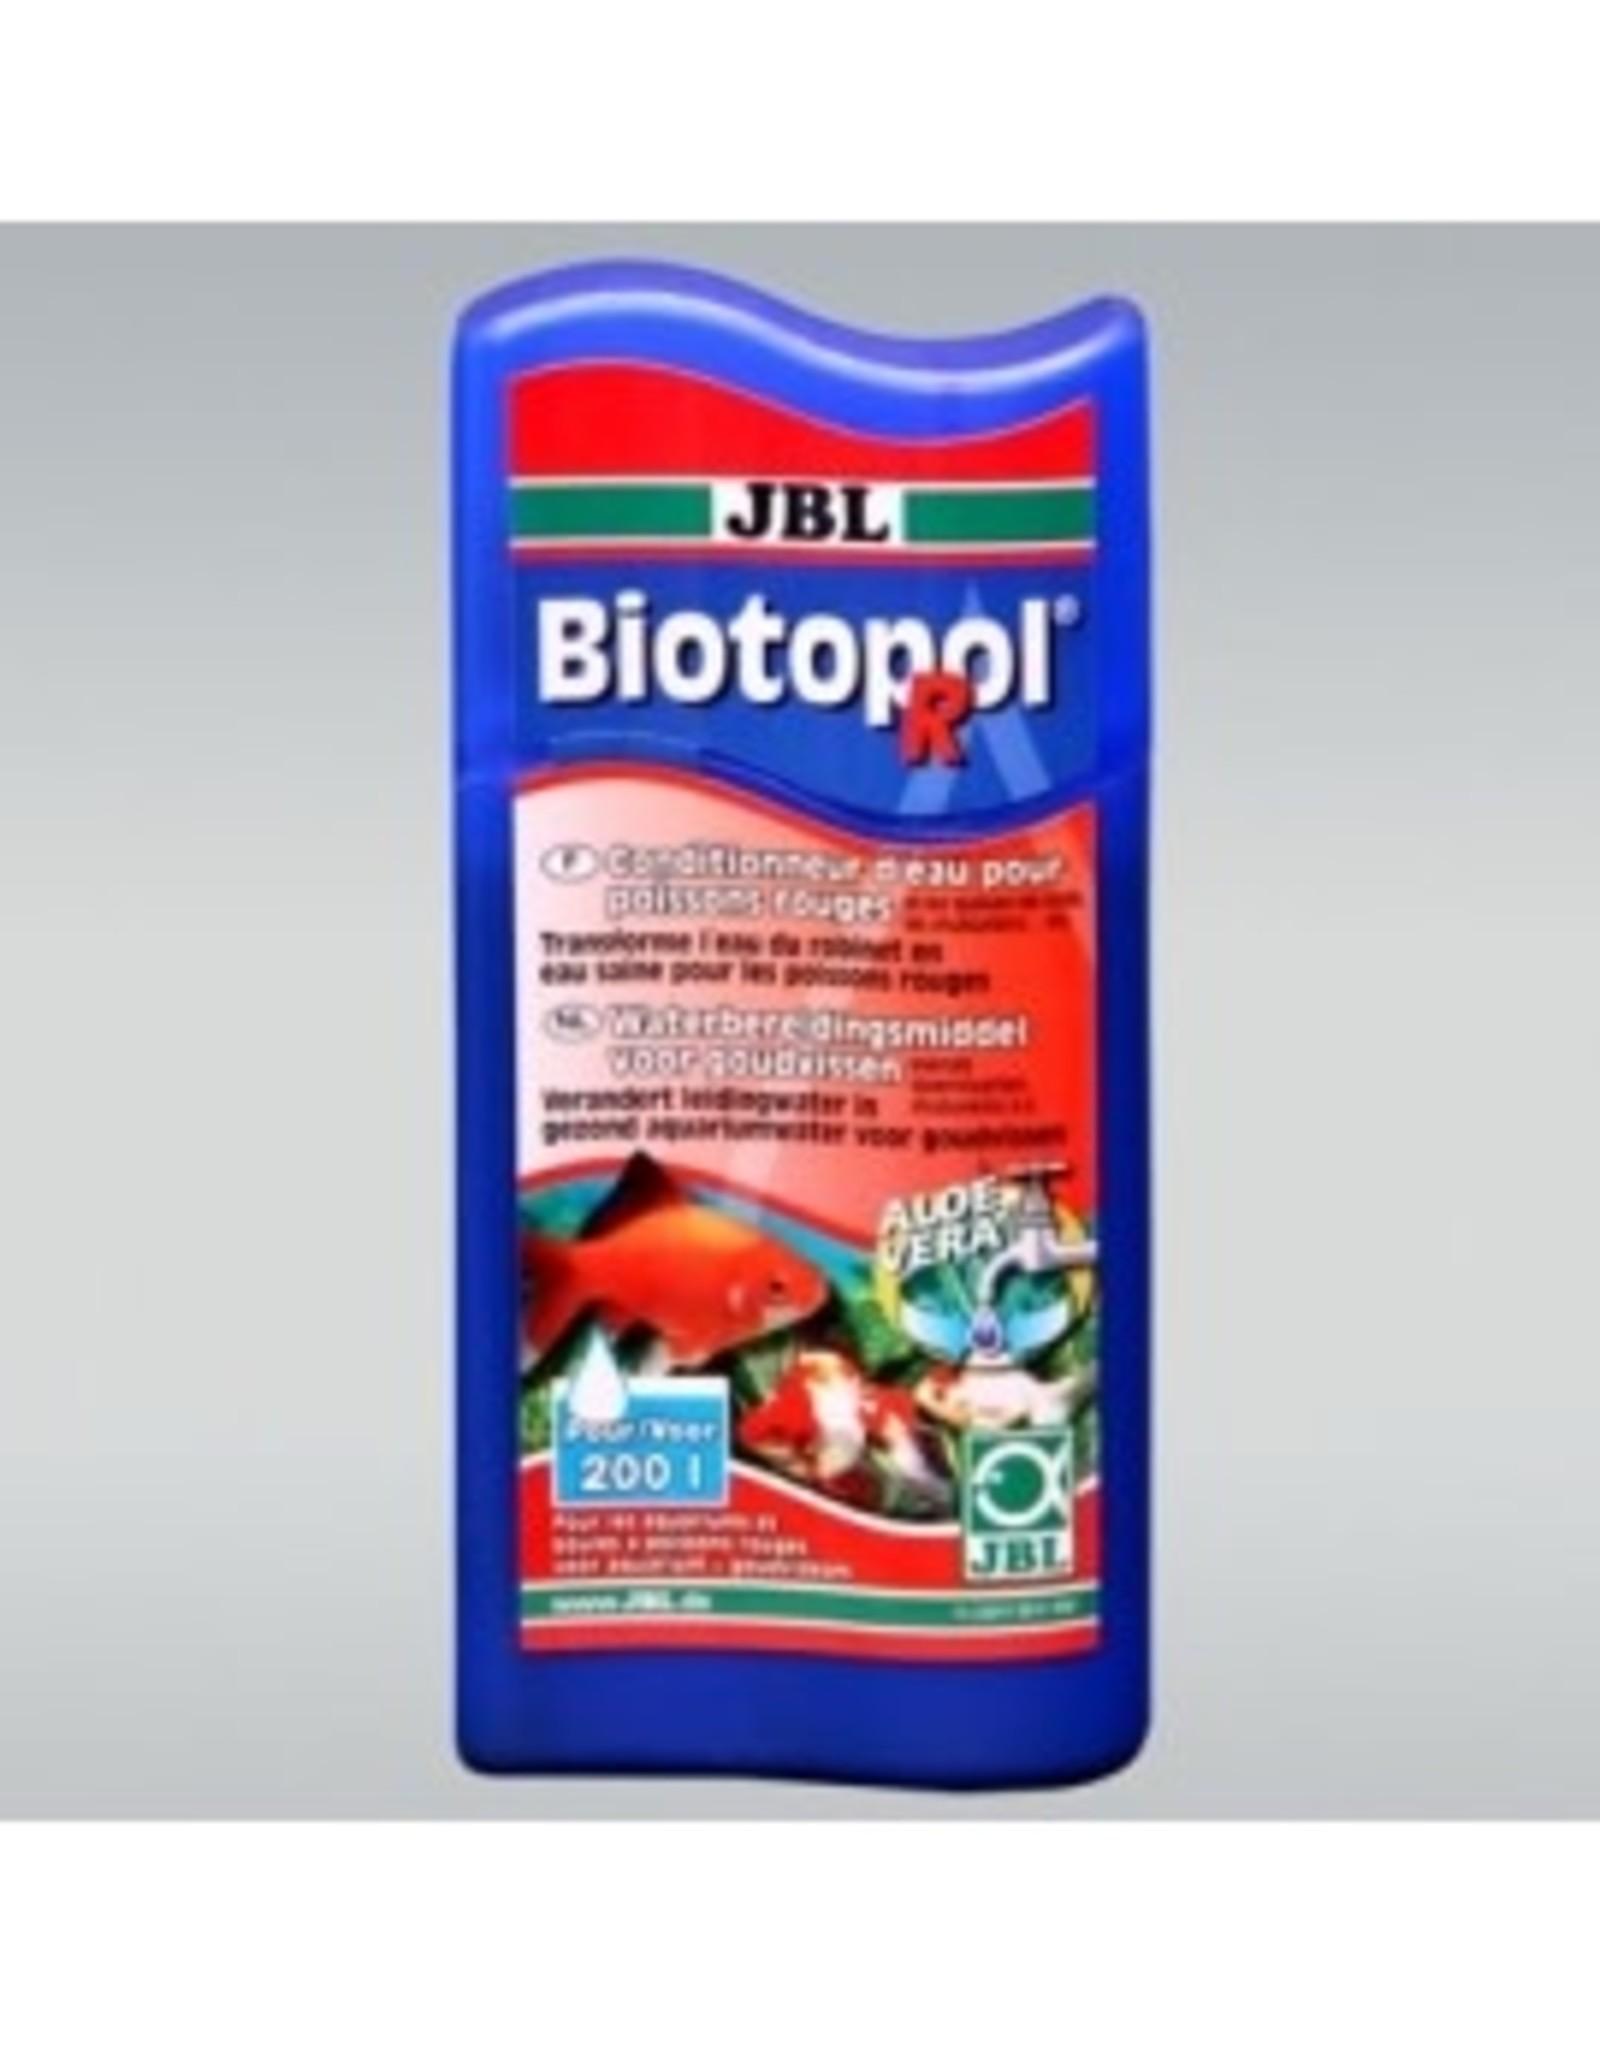 JBL BIOTOPOL poisson rouge